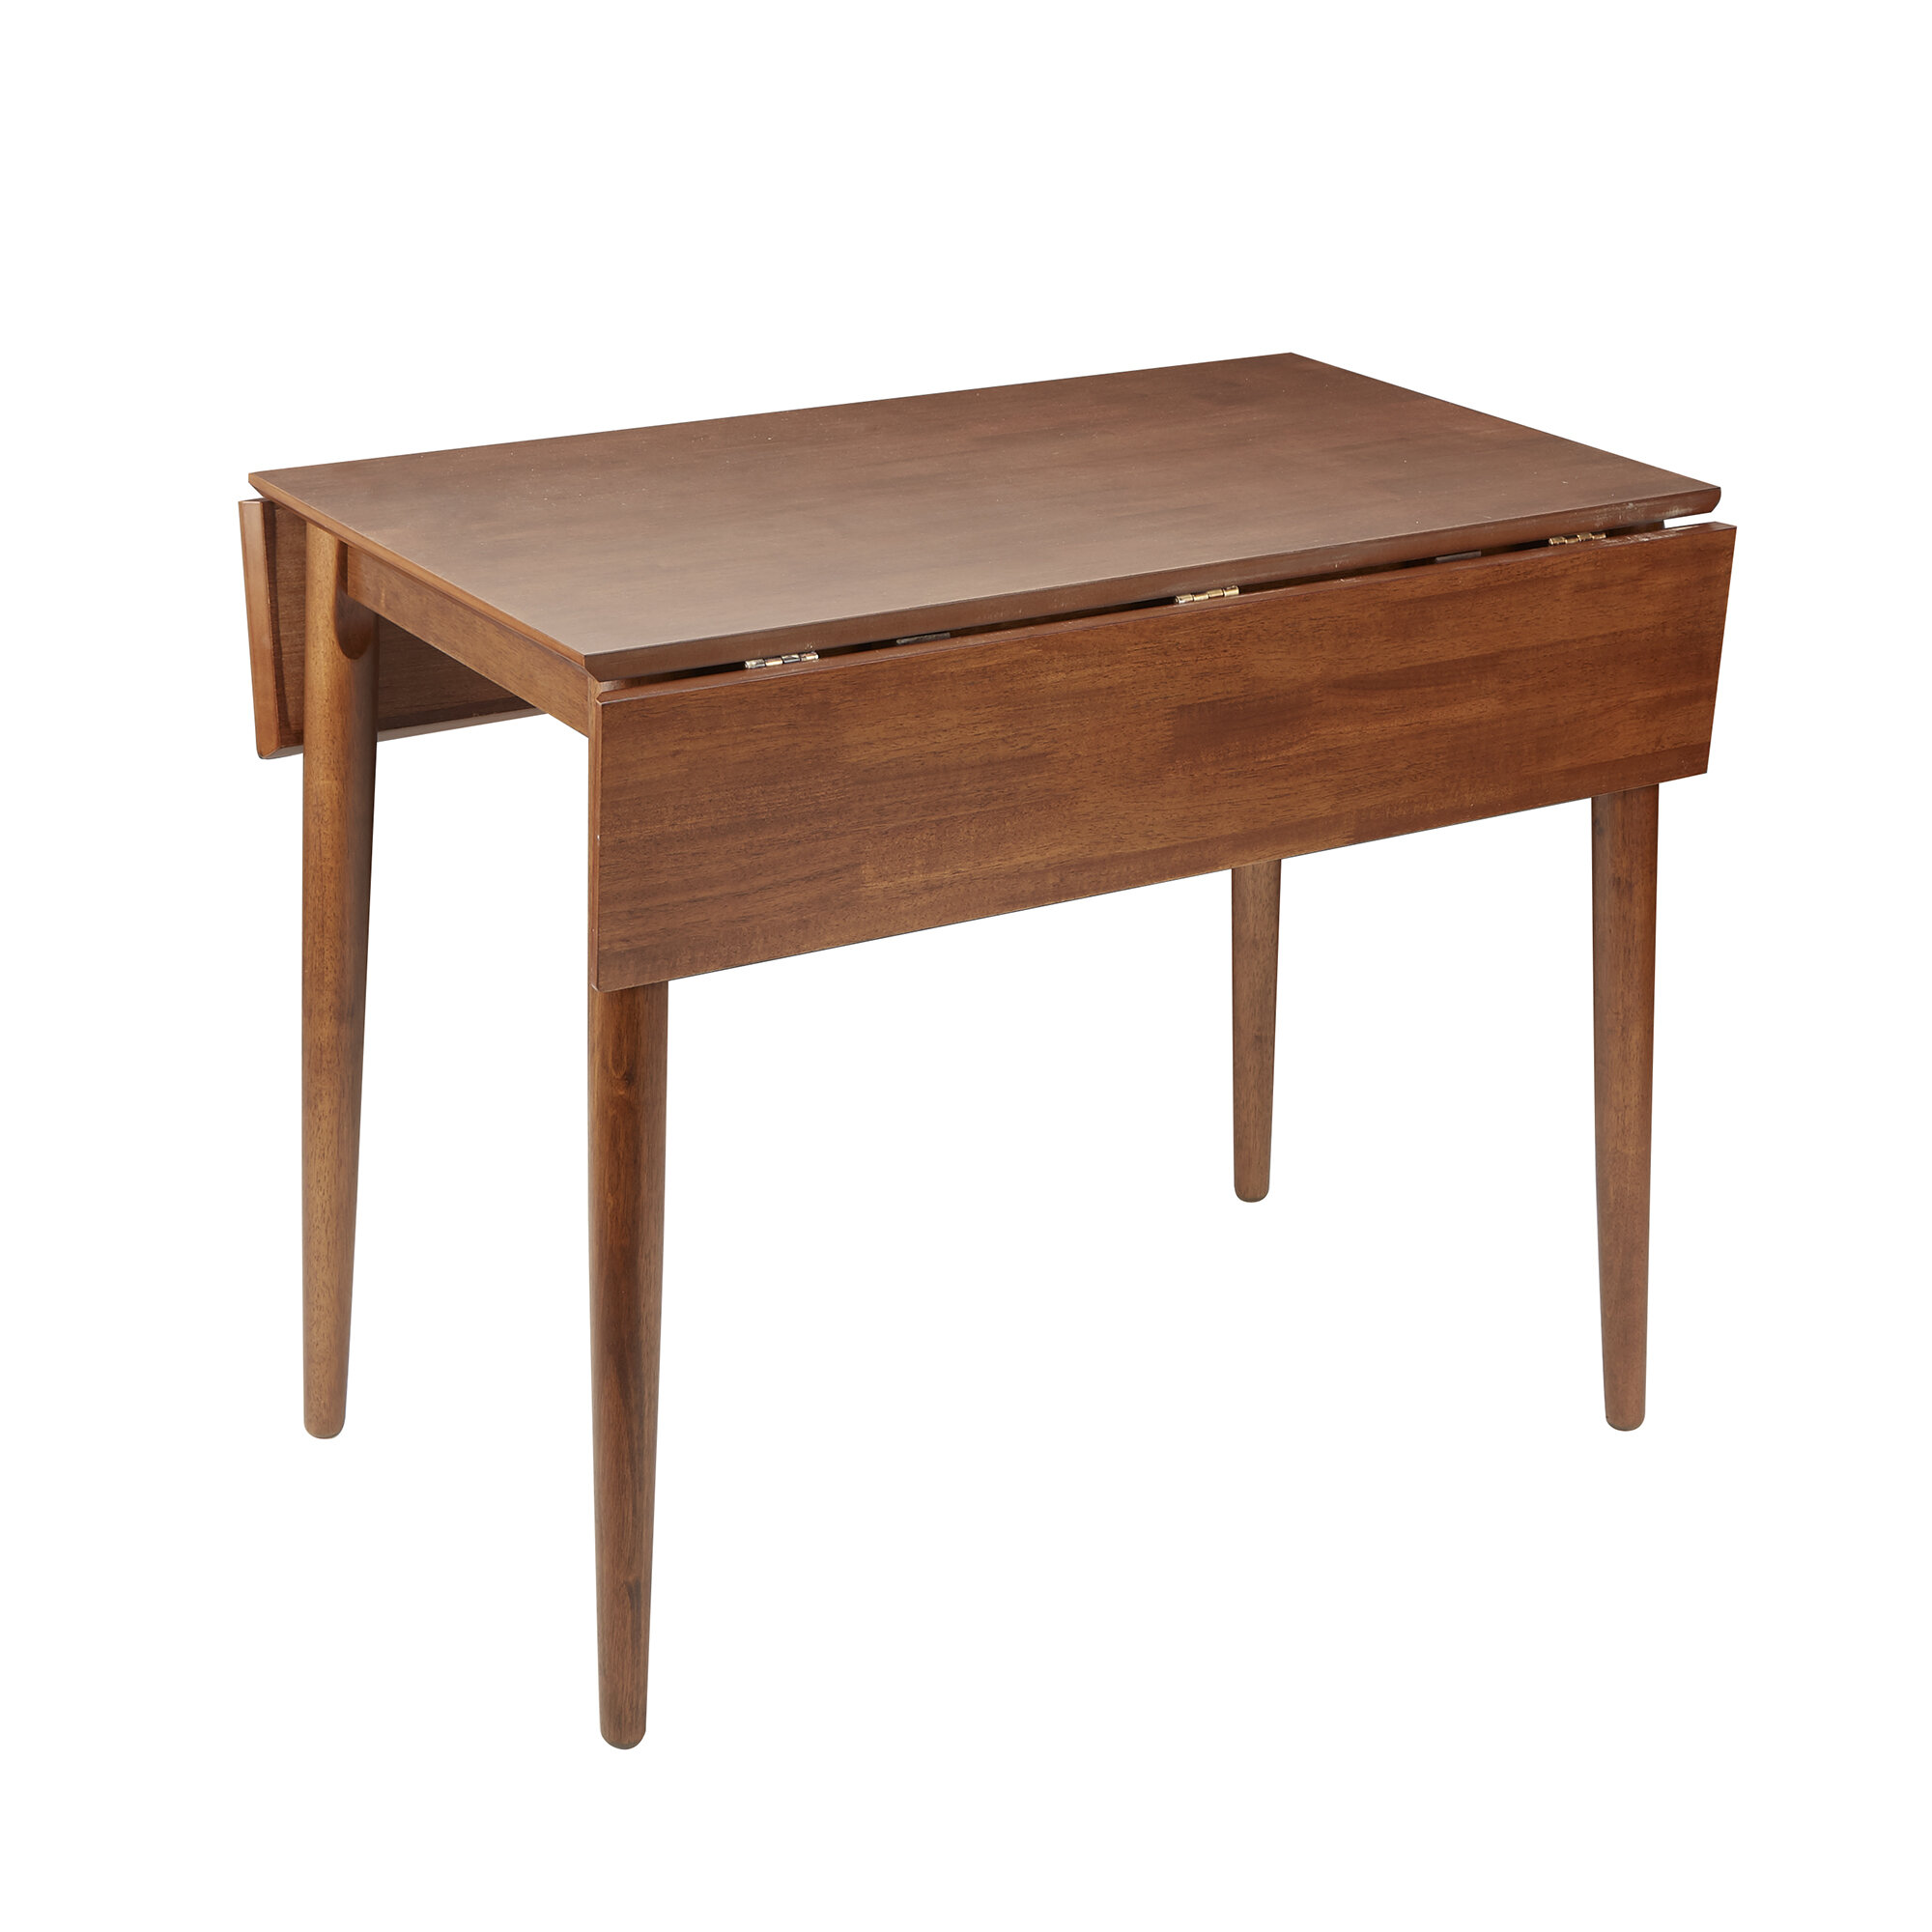 Ebern Designs Alidade Mid Century Modern Drop Leaf Dining Table Reviews Wayfair